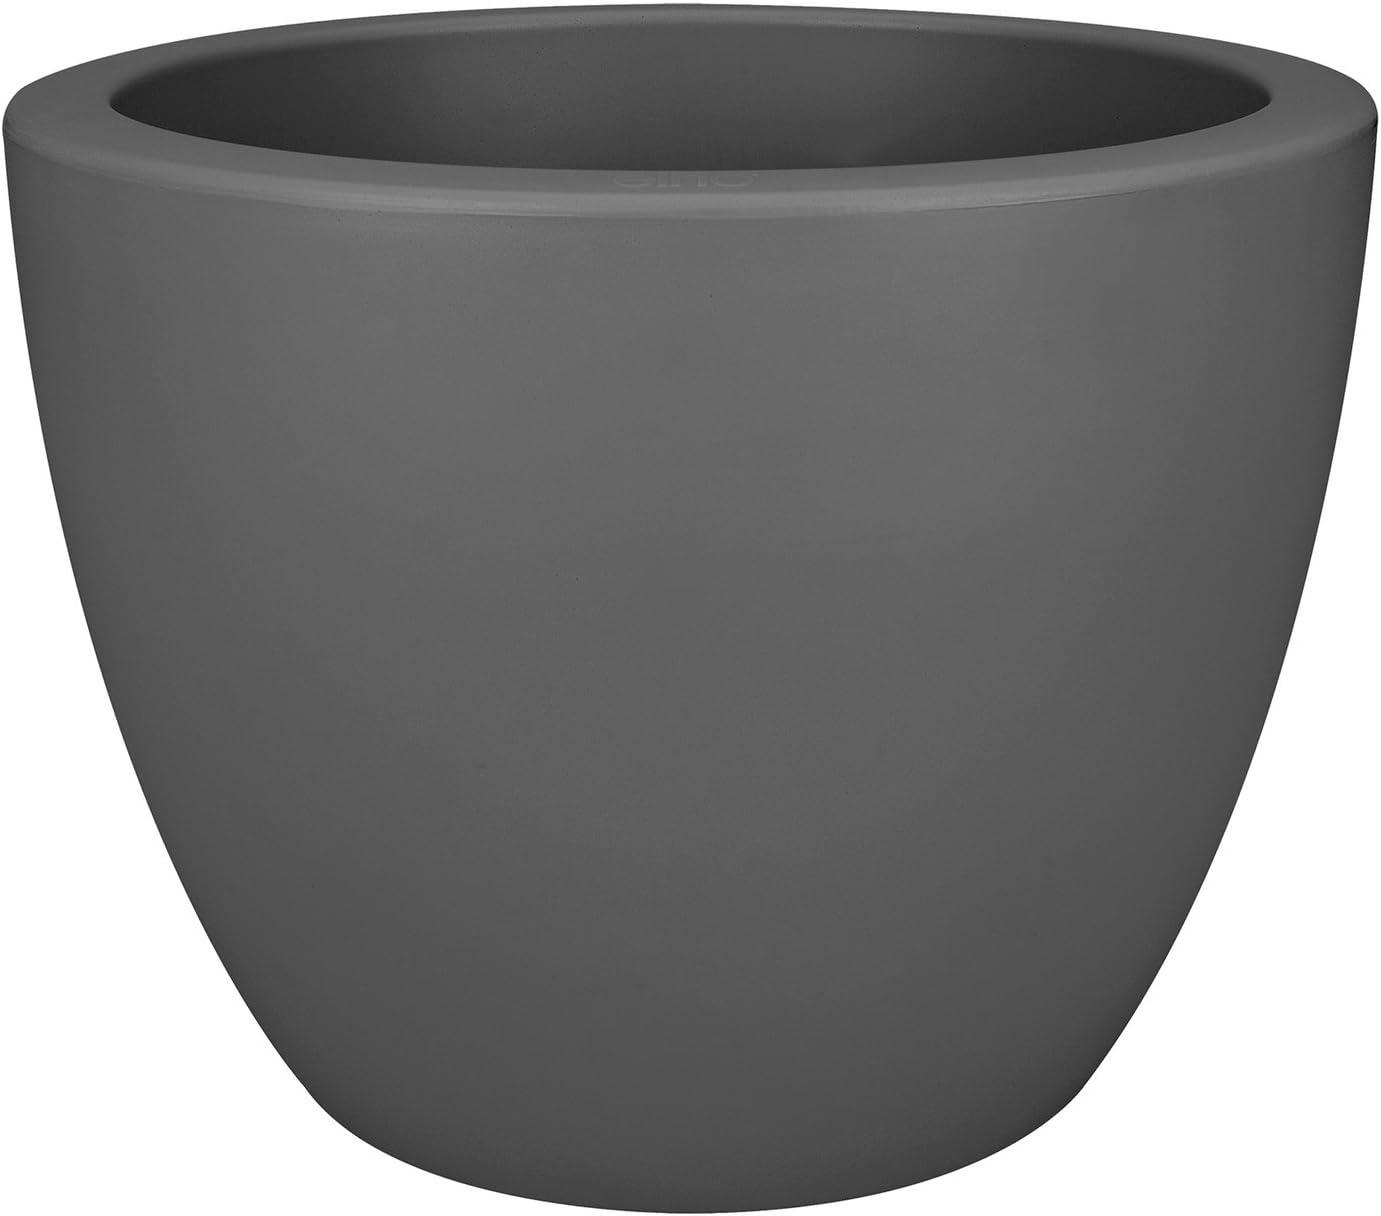 Elho Pure Soft Round Macetero Redondo con Ruedas, Antracita, 39x39x30,4 cm